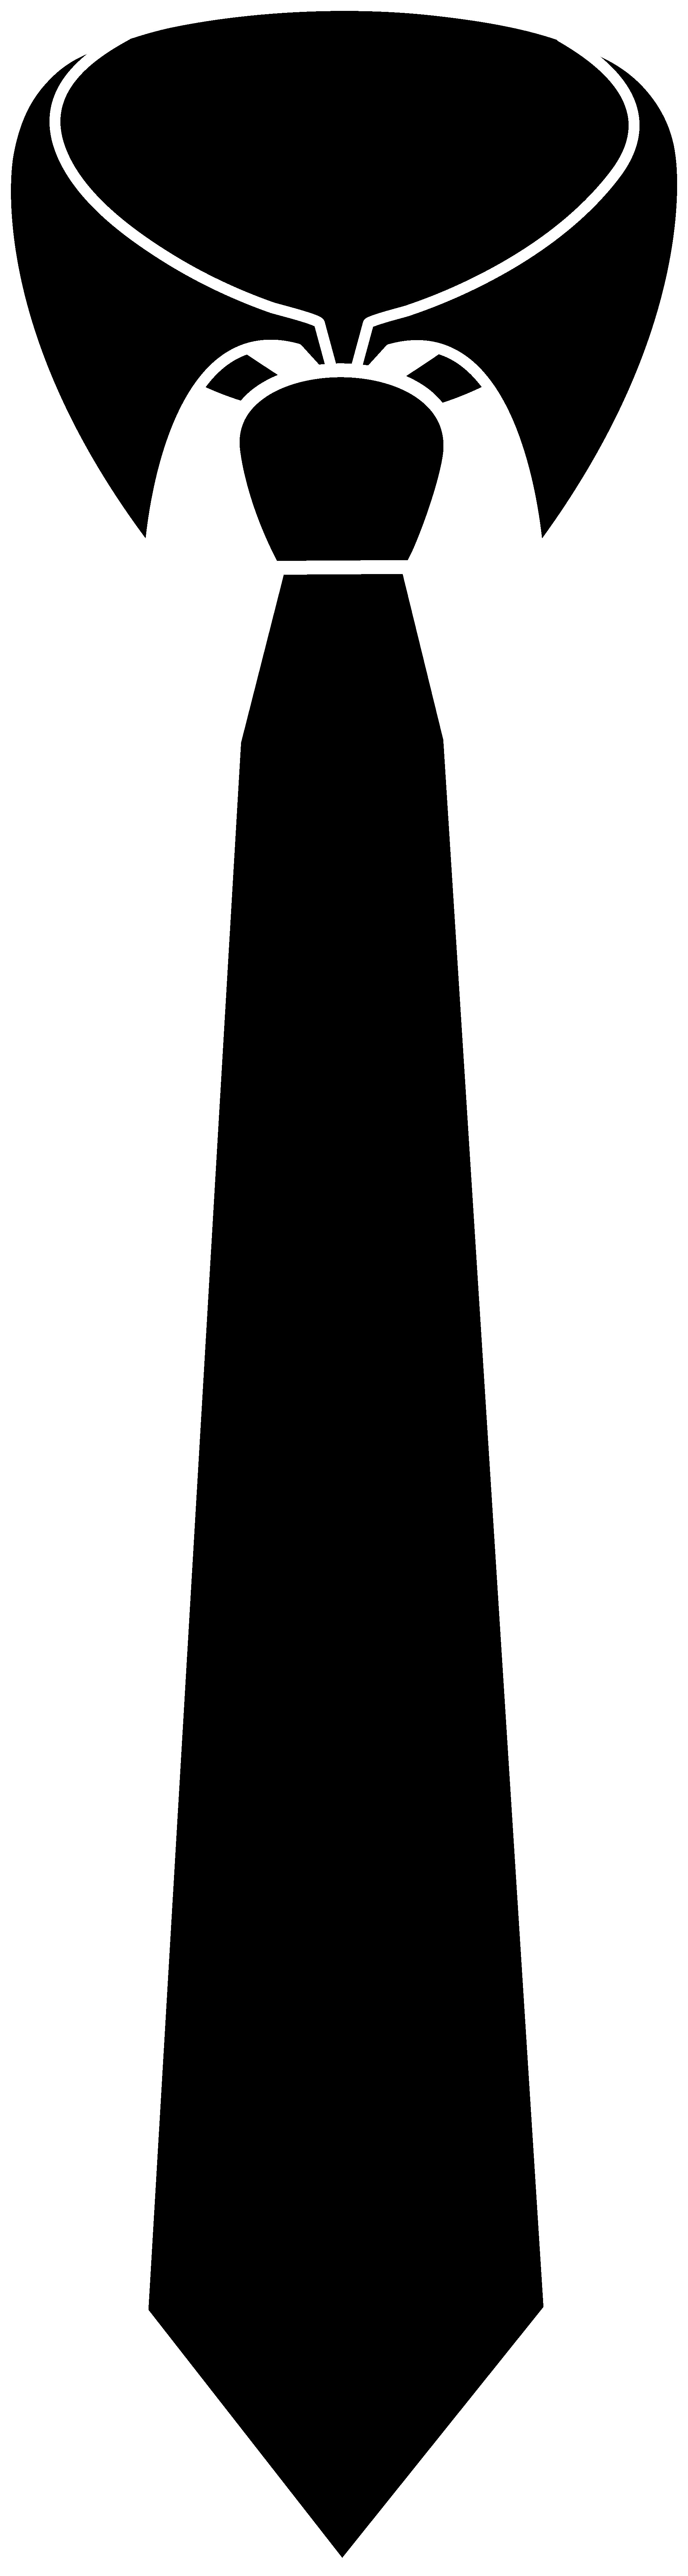 Tie Clip Art collar%20clipart